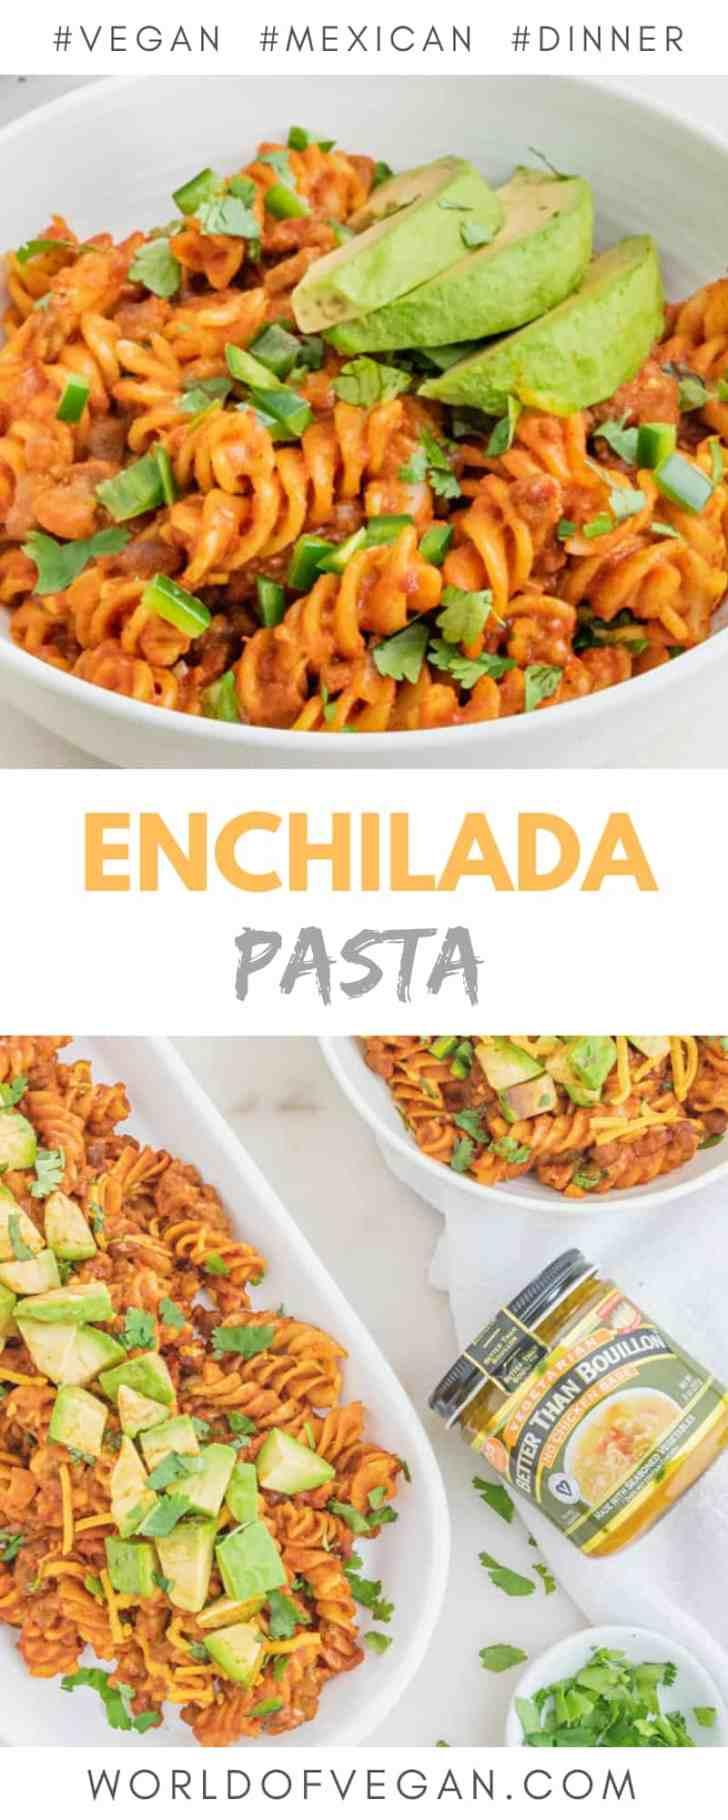 How to Make Vegan Enchilada Pasta Photo